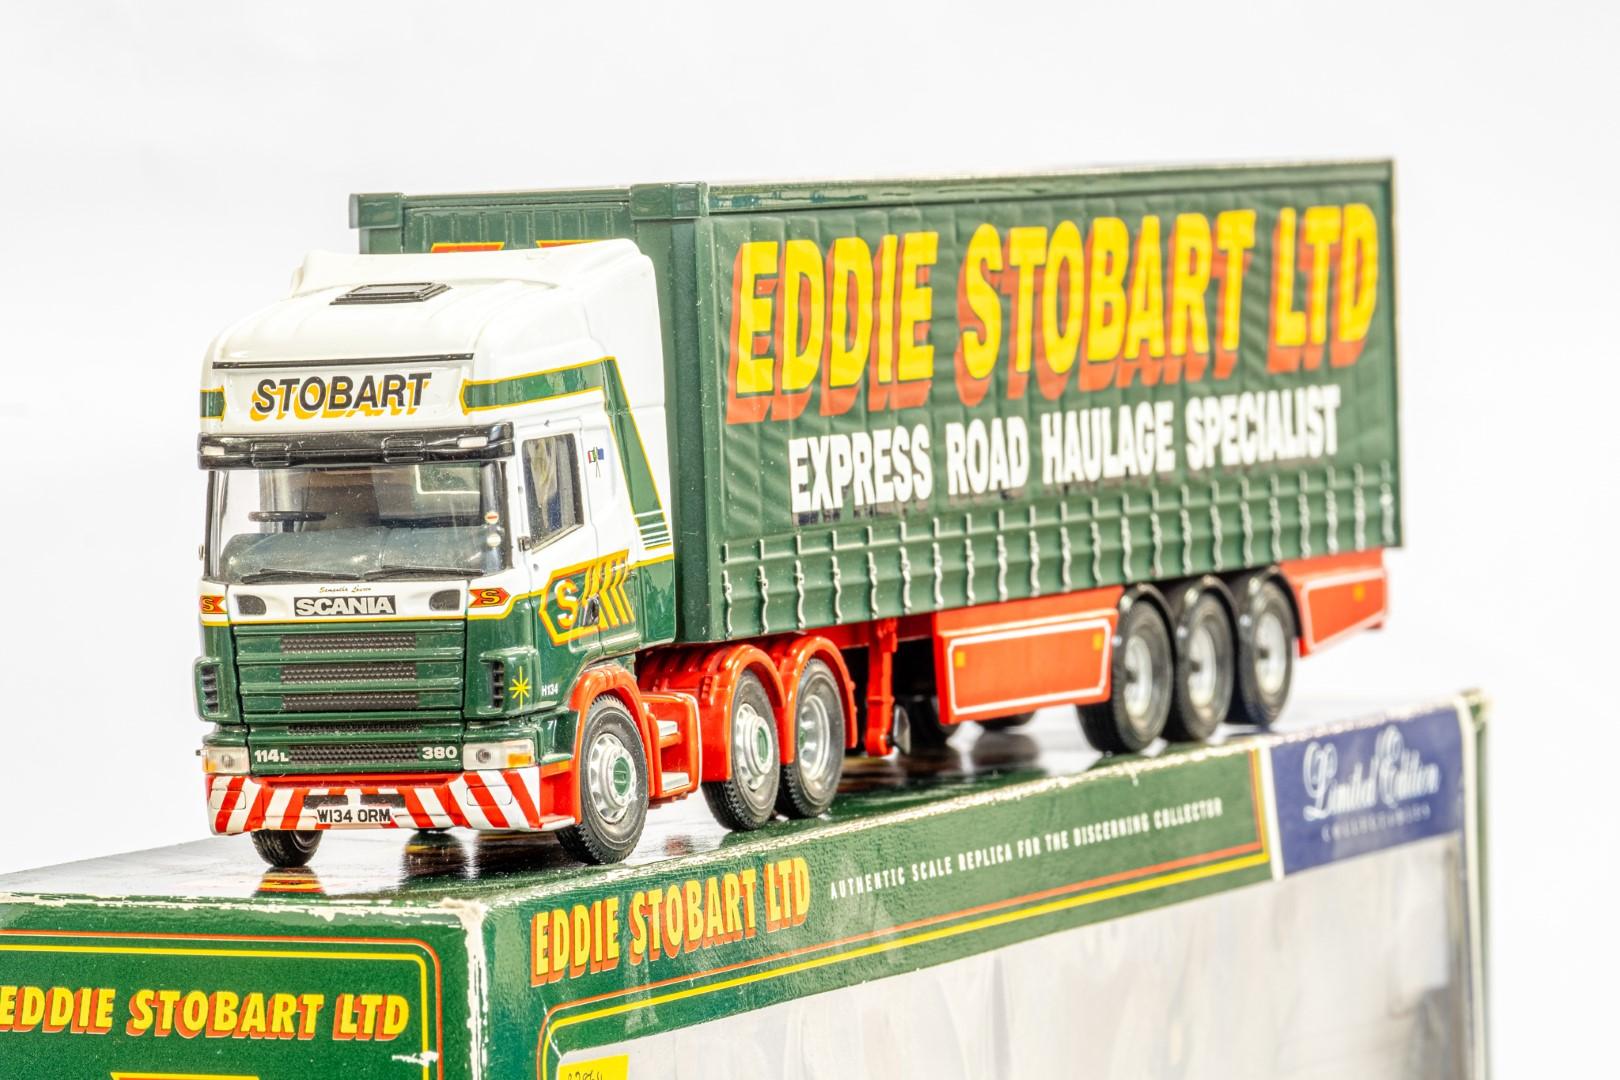 Corgi Scania Topline Curtainside Trailer - Eddie Stobart - Image 4 of 7